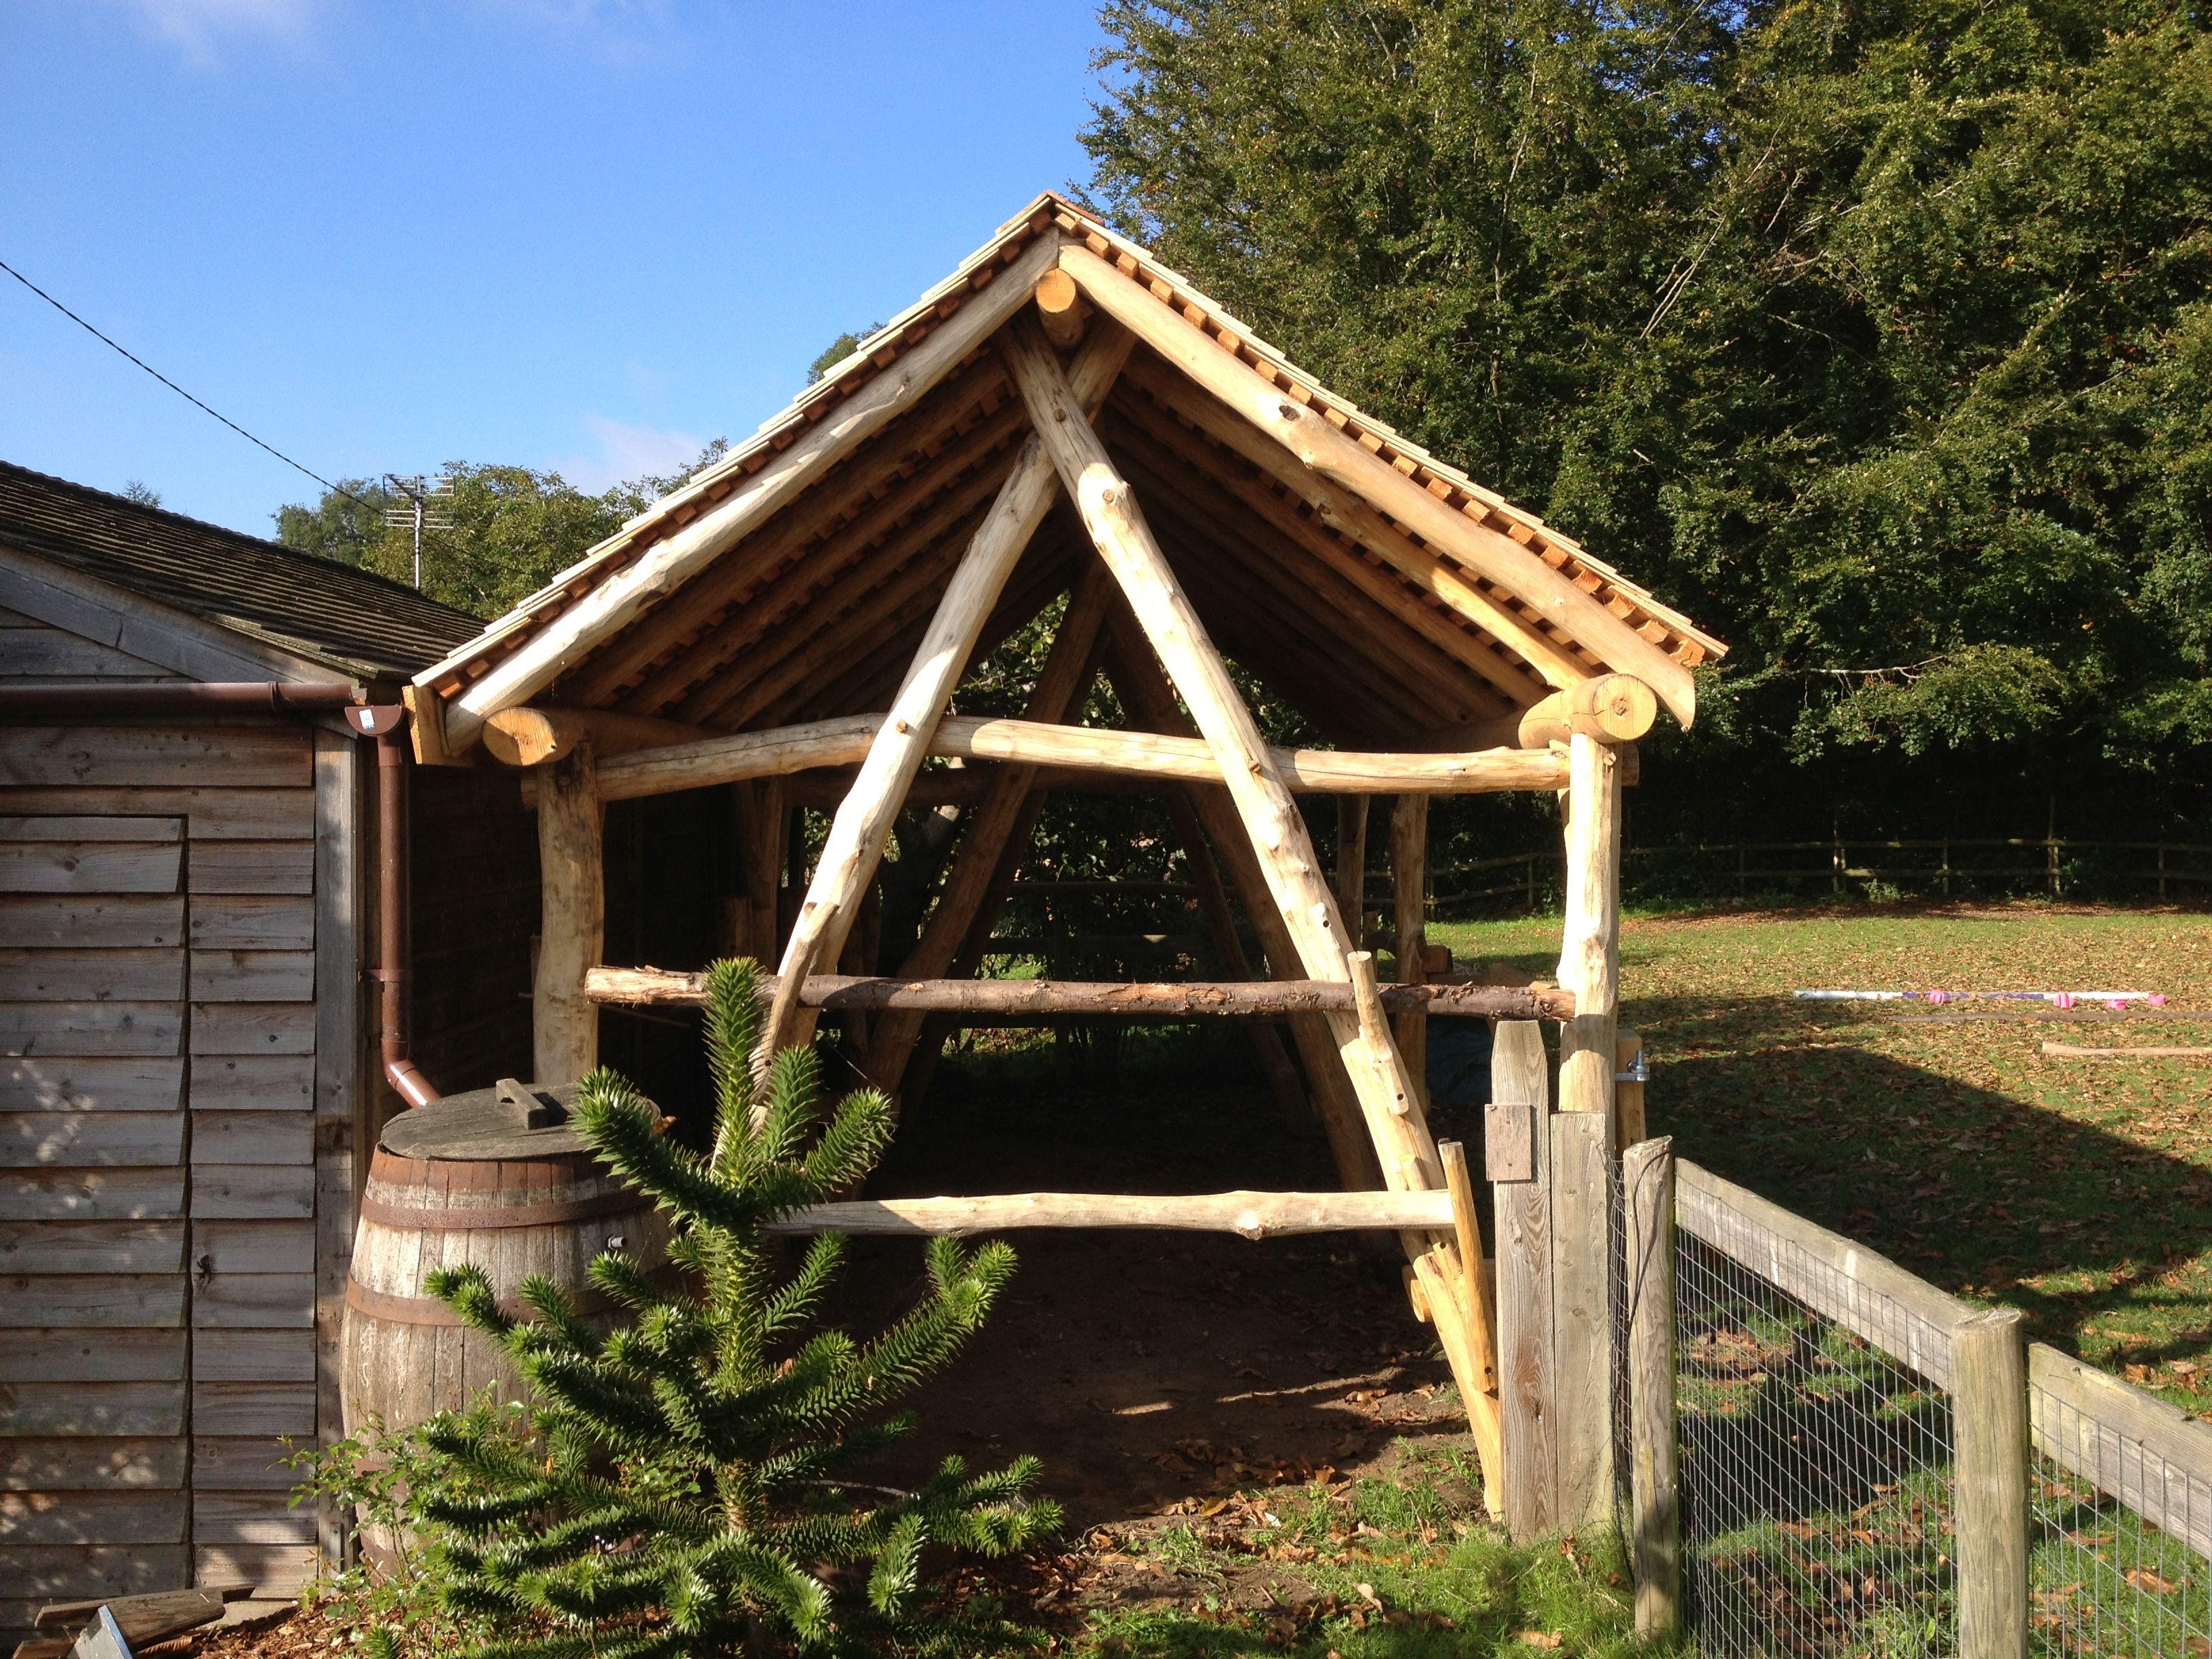 Cruck frame ideas for the house pinterest cabin for Cruck frame house plans